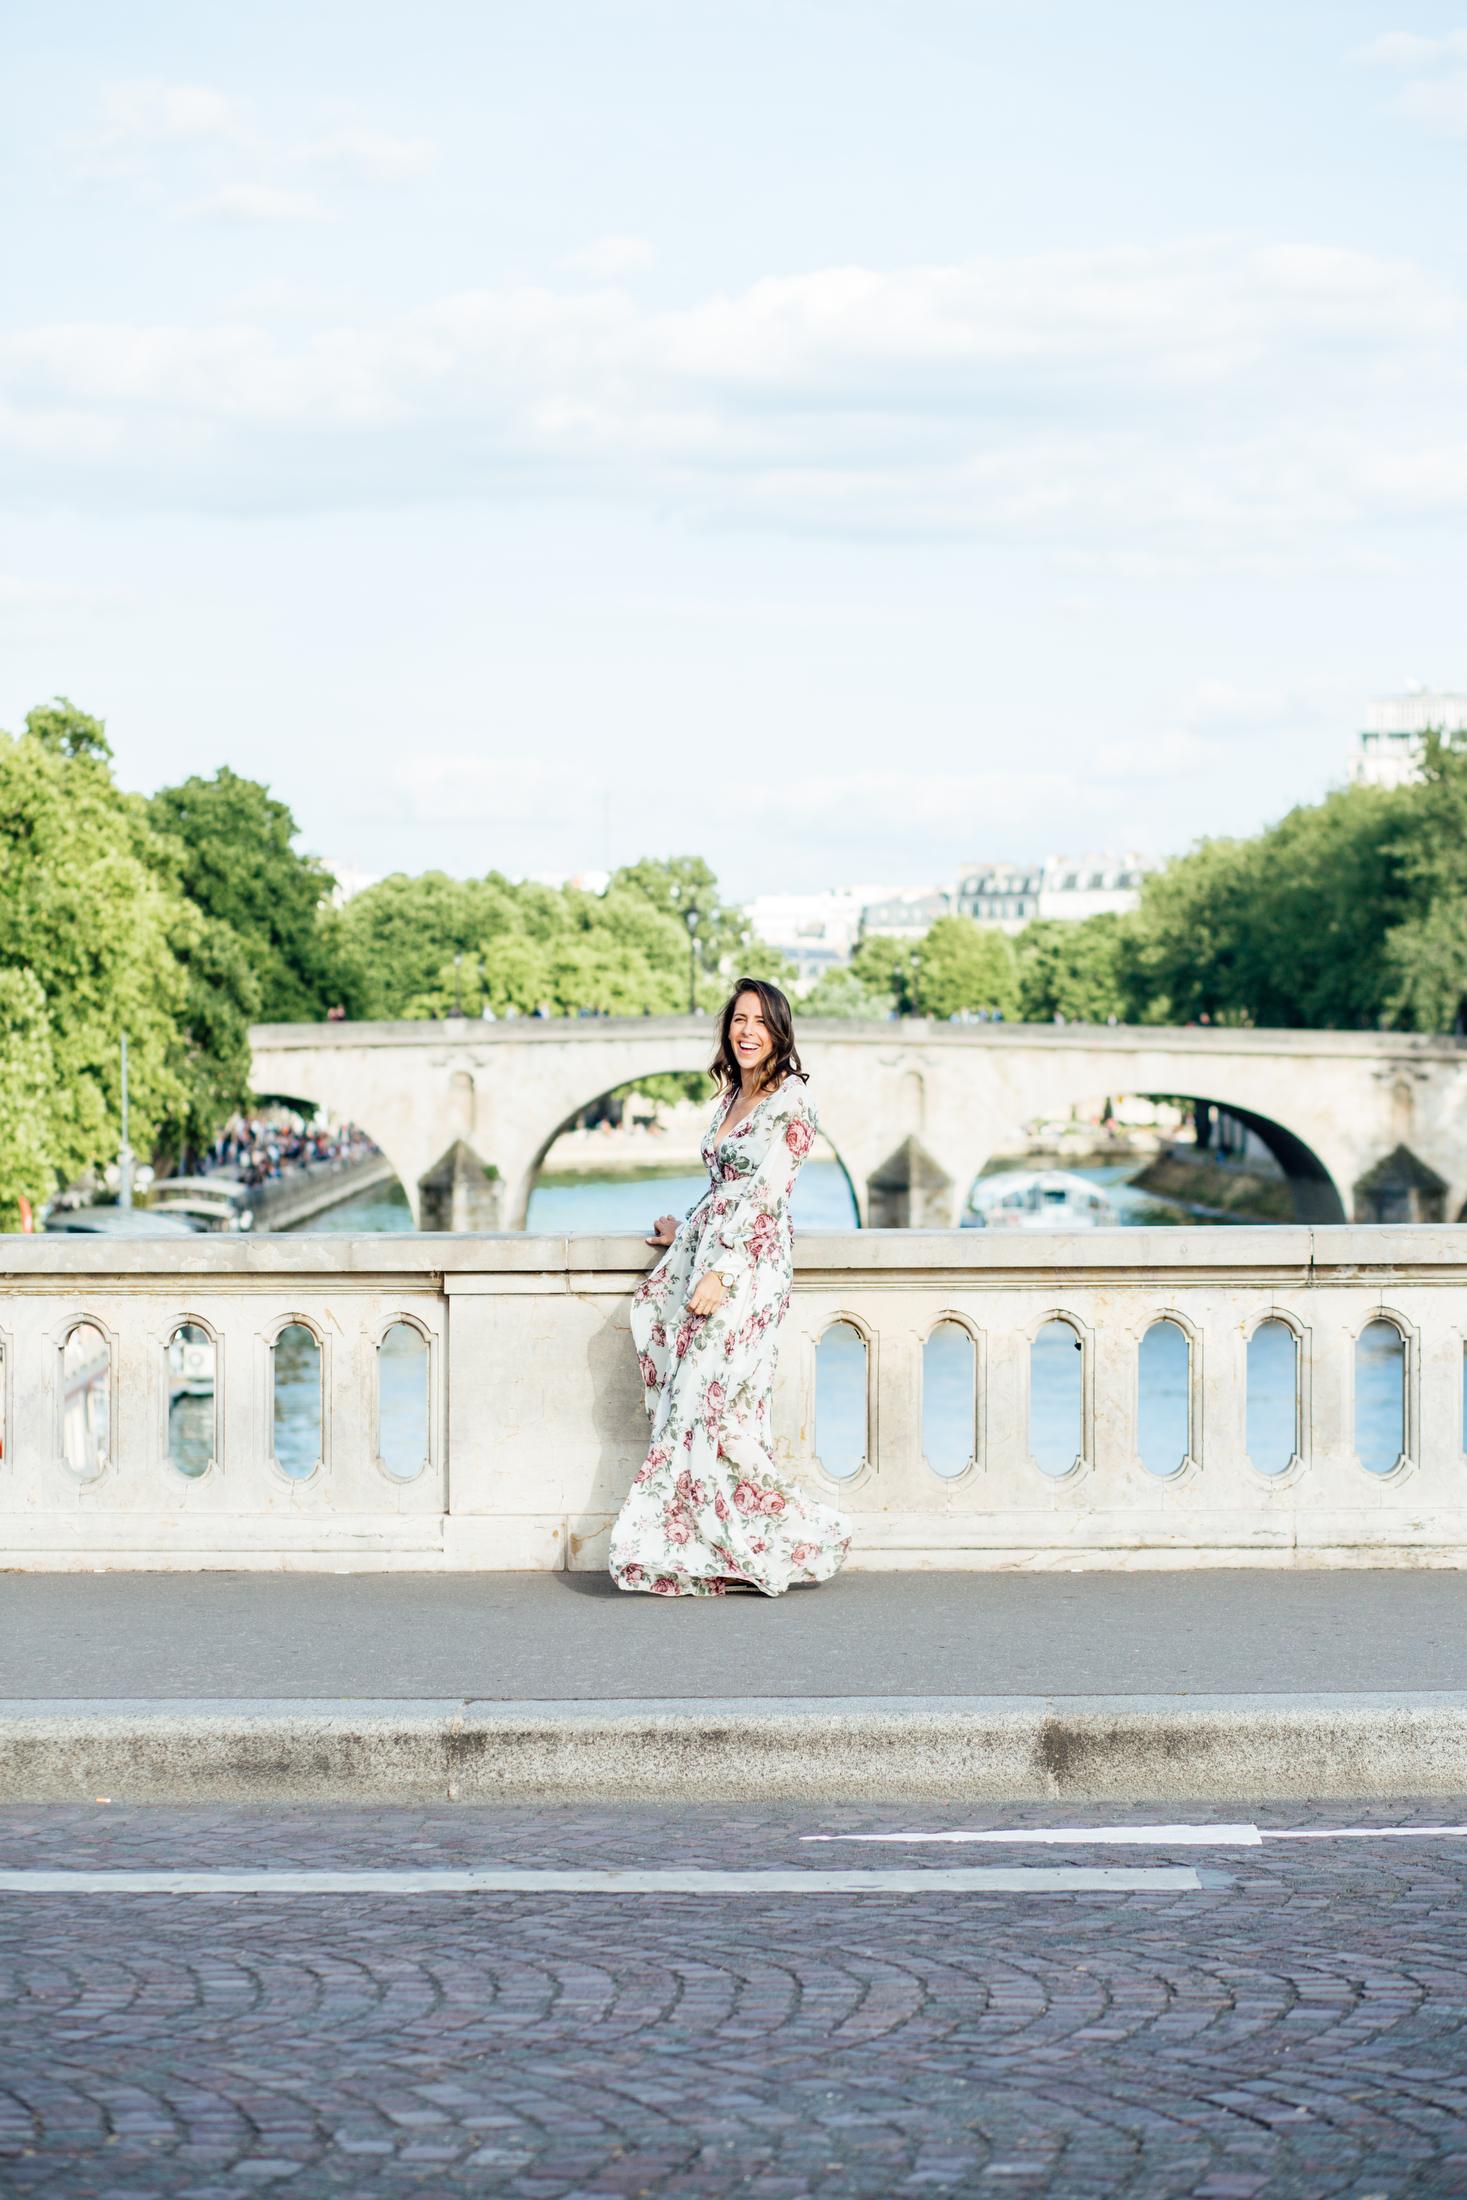 Rachelle Saeville by Bettina Bogar0014.JPG